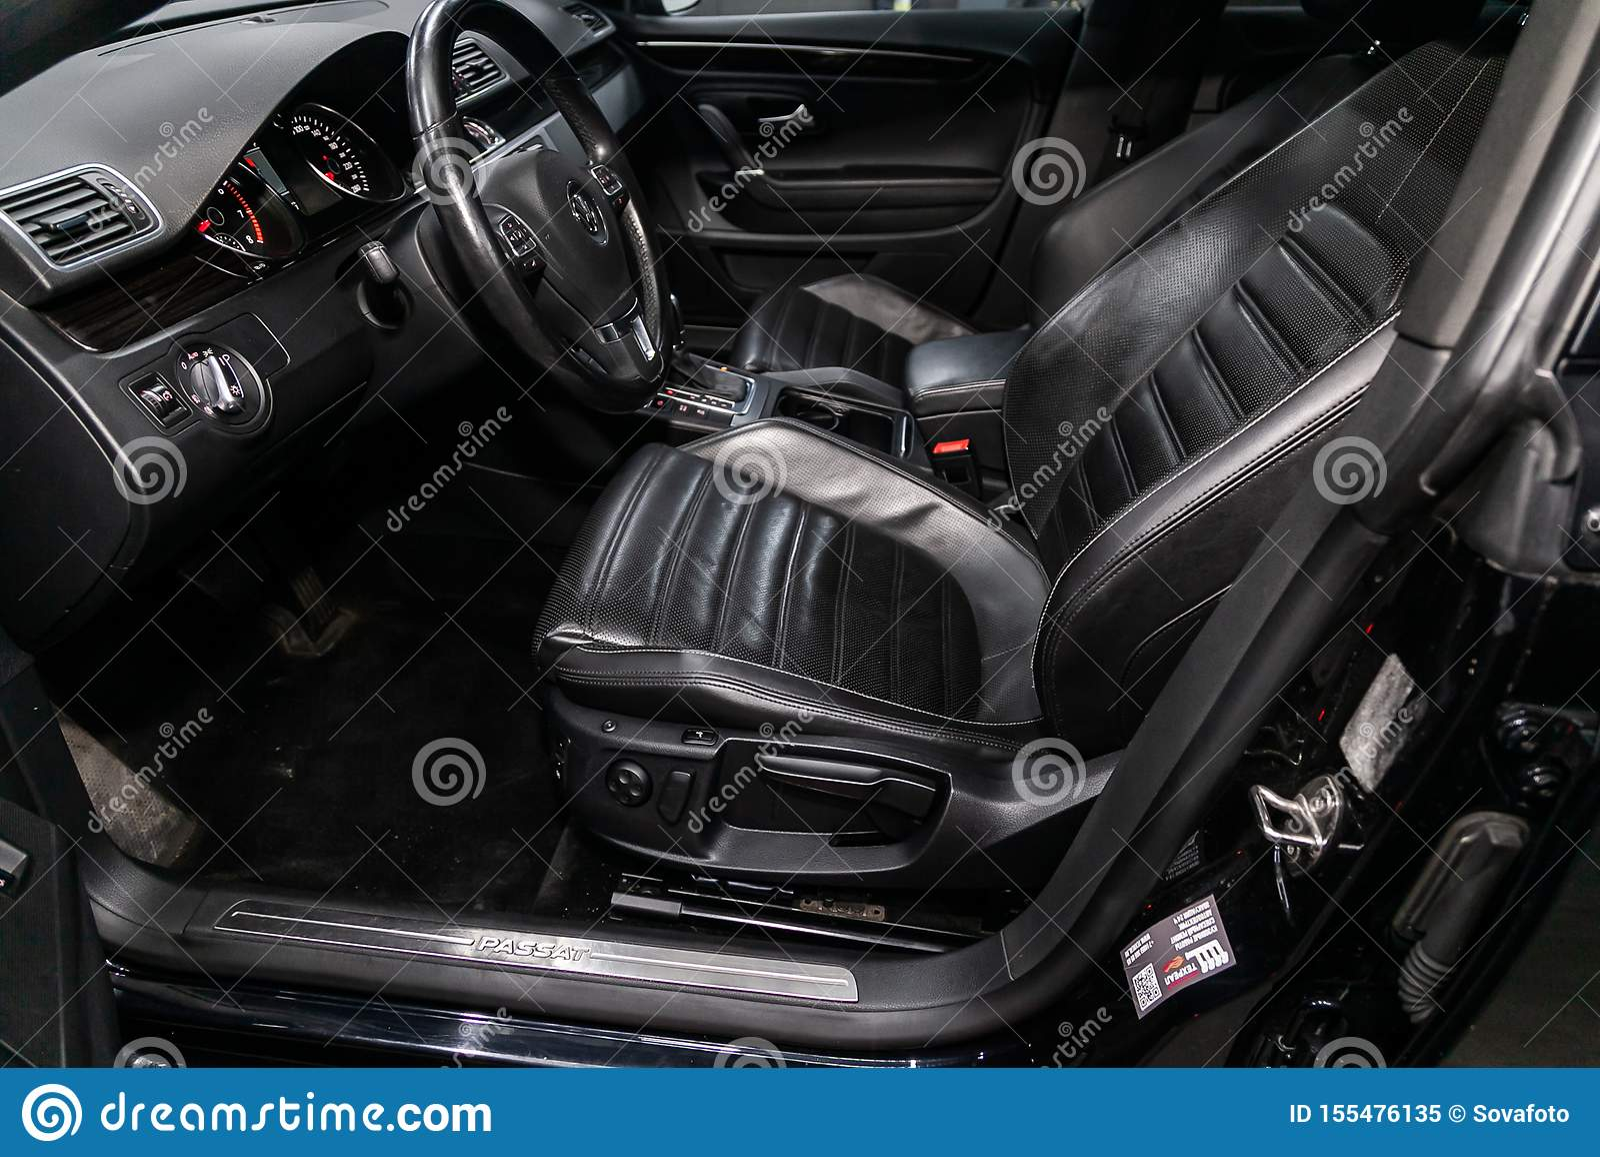 Novosibirsk Russia July 30 2019 Volkswagen Passat Cc Editorial Image Image Of Interior Automobile 155476135